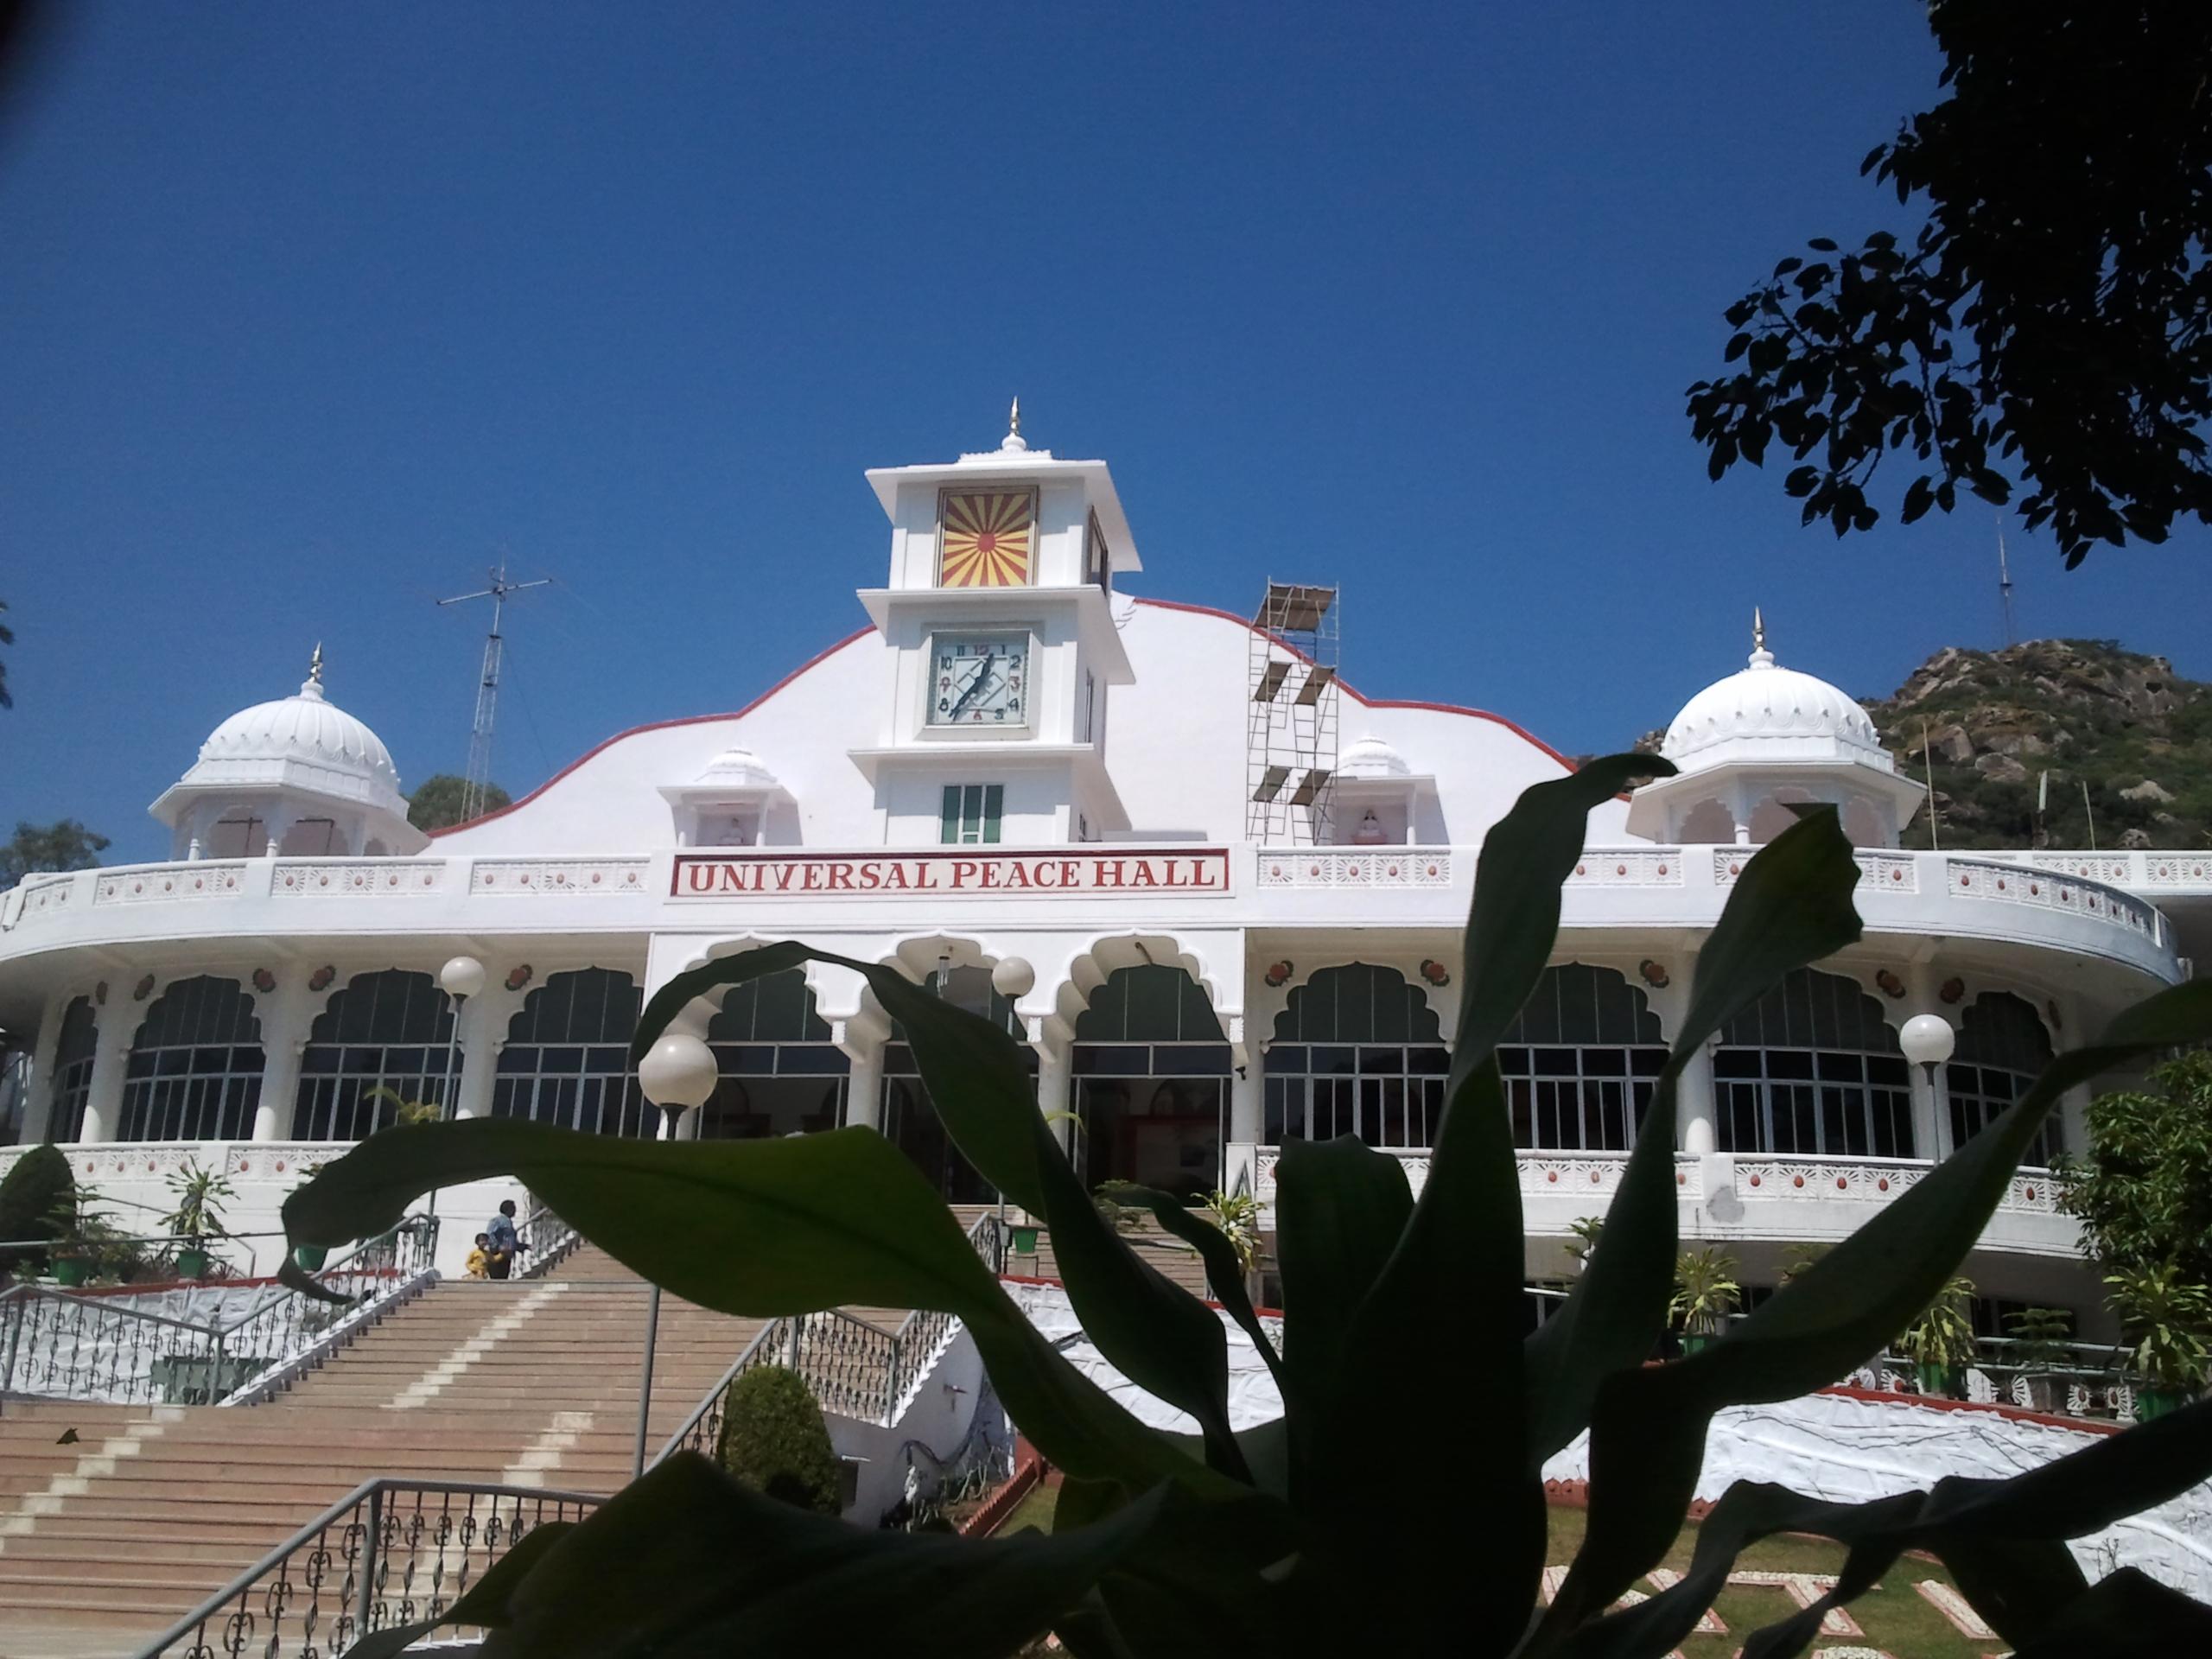 File:Universal Peace Hall- Mt.Abu- Rajasthan.jpg - Wikimedia Commons